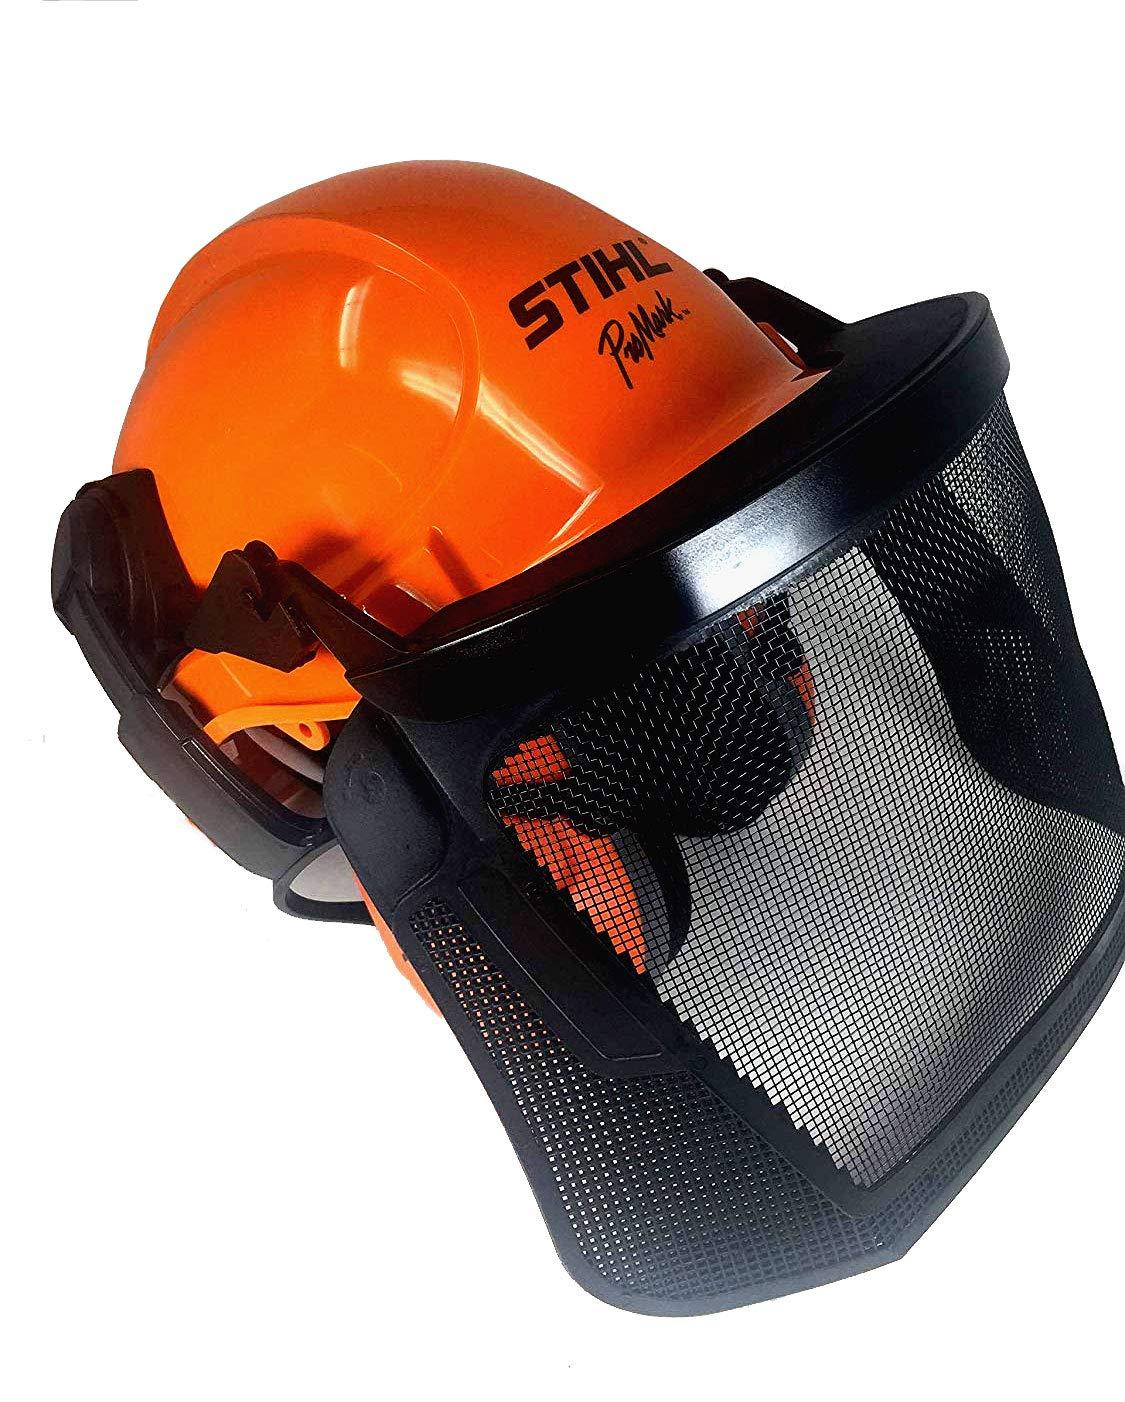 Stihl 7010-871-0199 ProMark Forestry Helmet System by Stihl (Image #2)